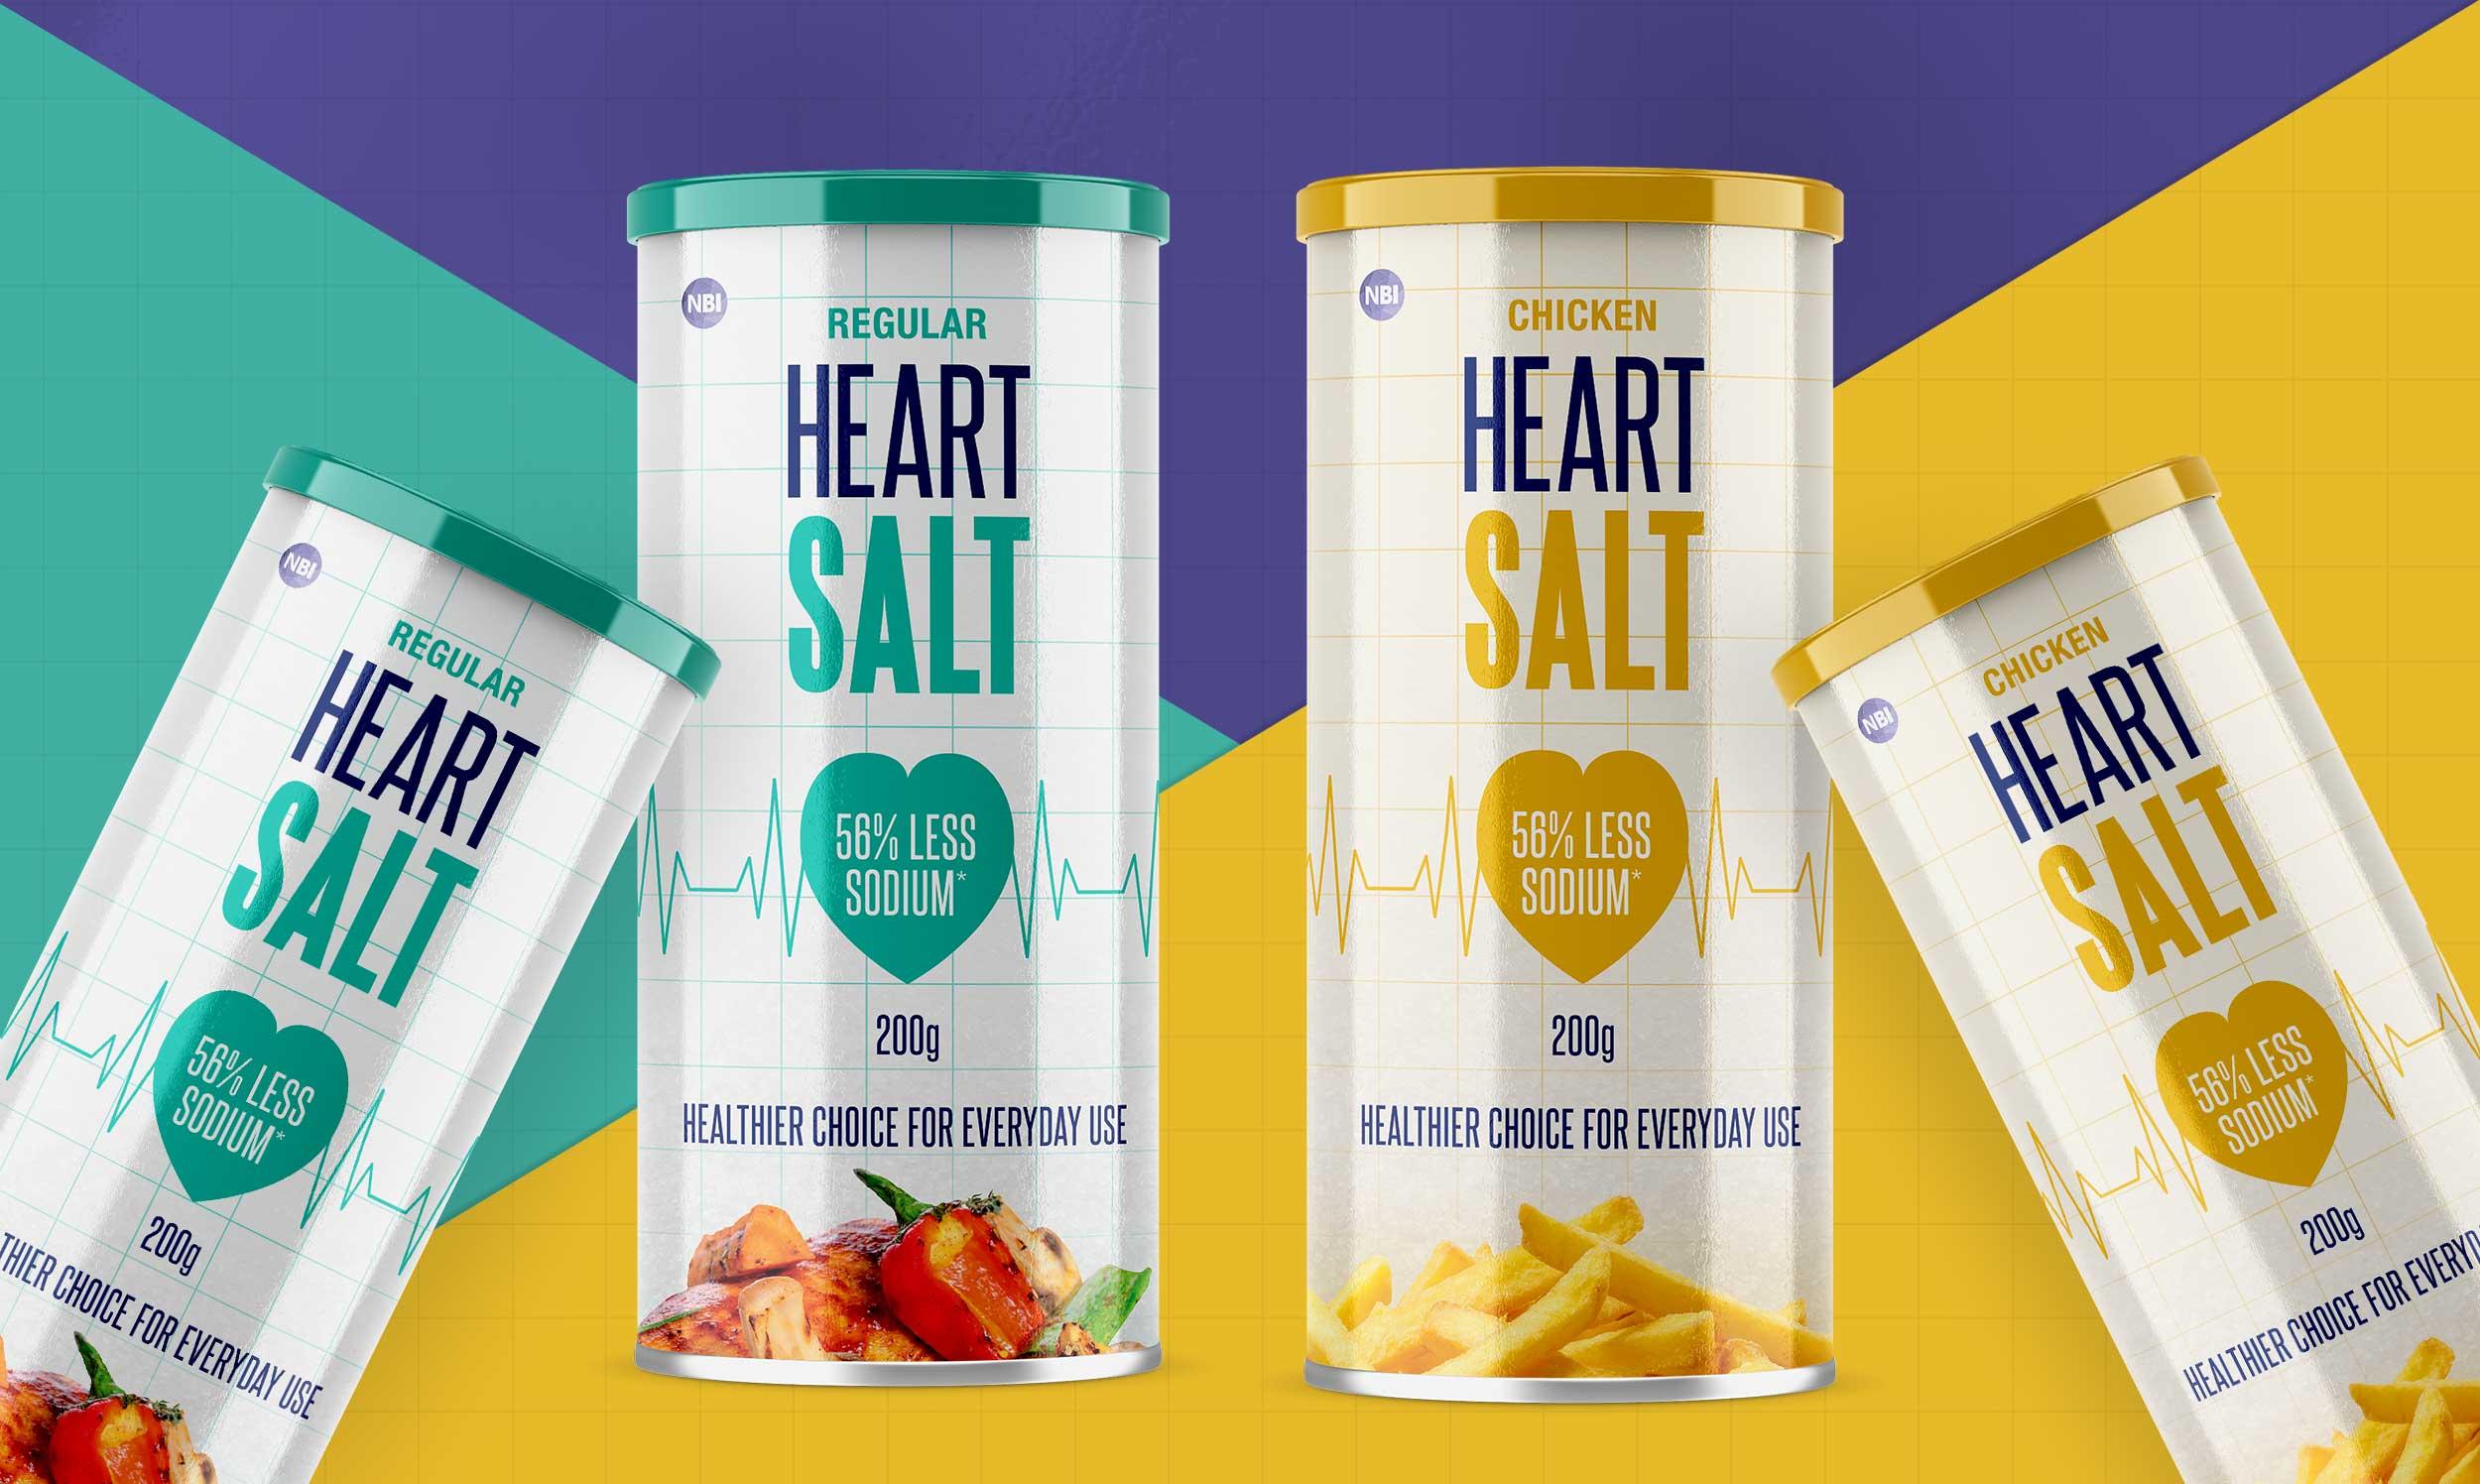 Handle-Branding_Heart-Salt_Packaging_All_001.jpg